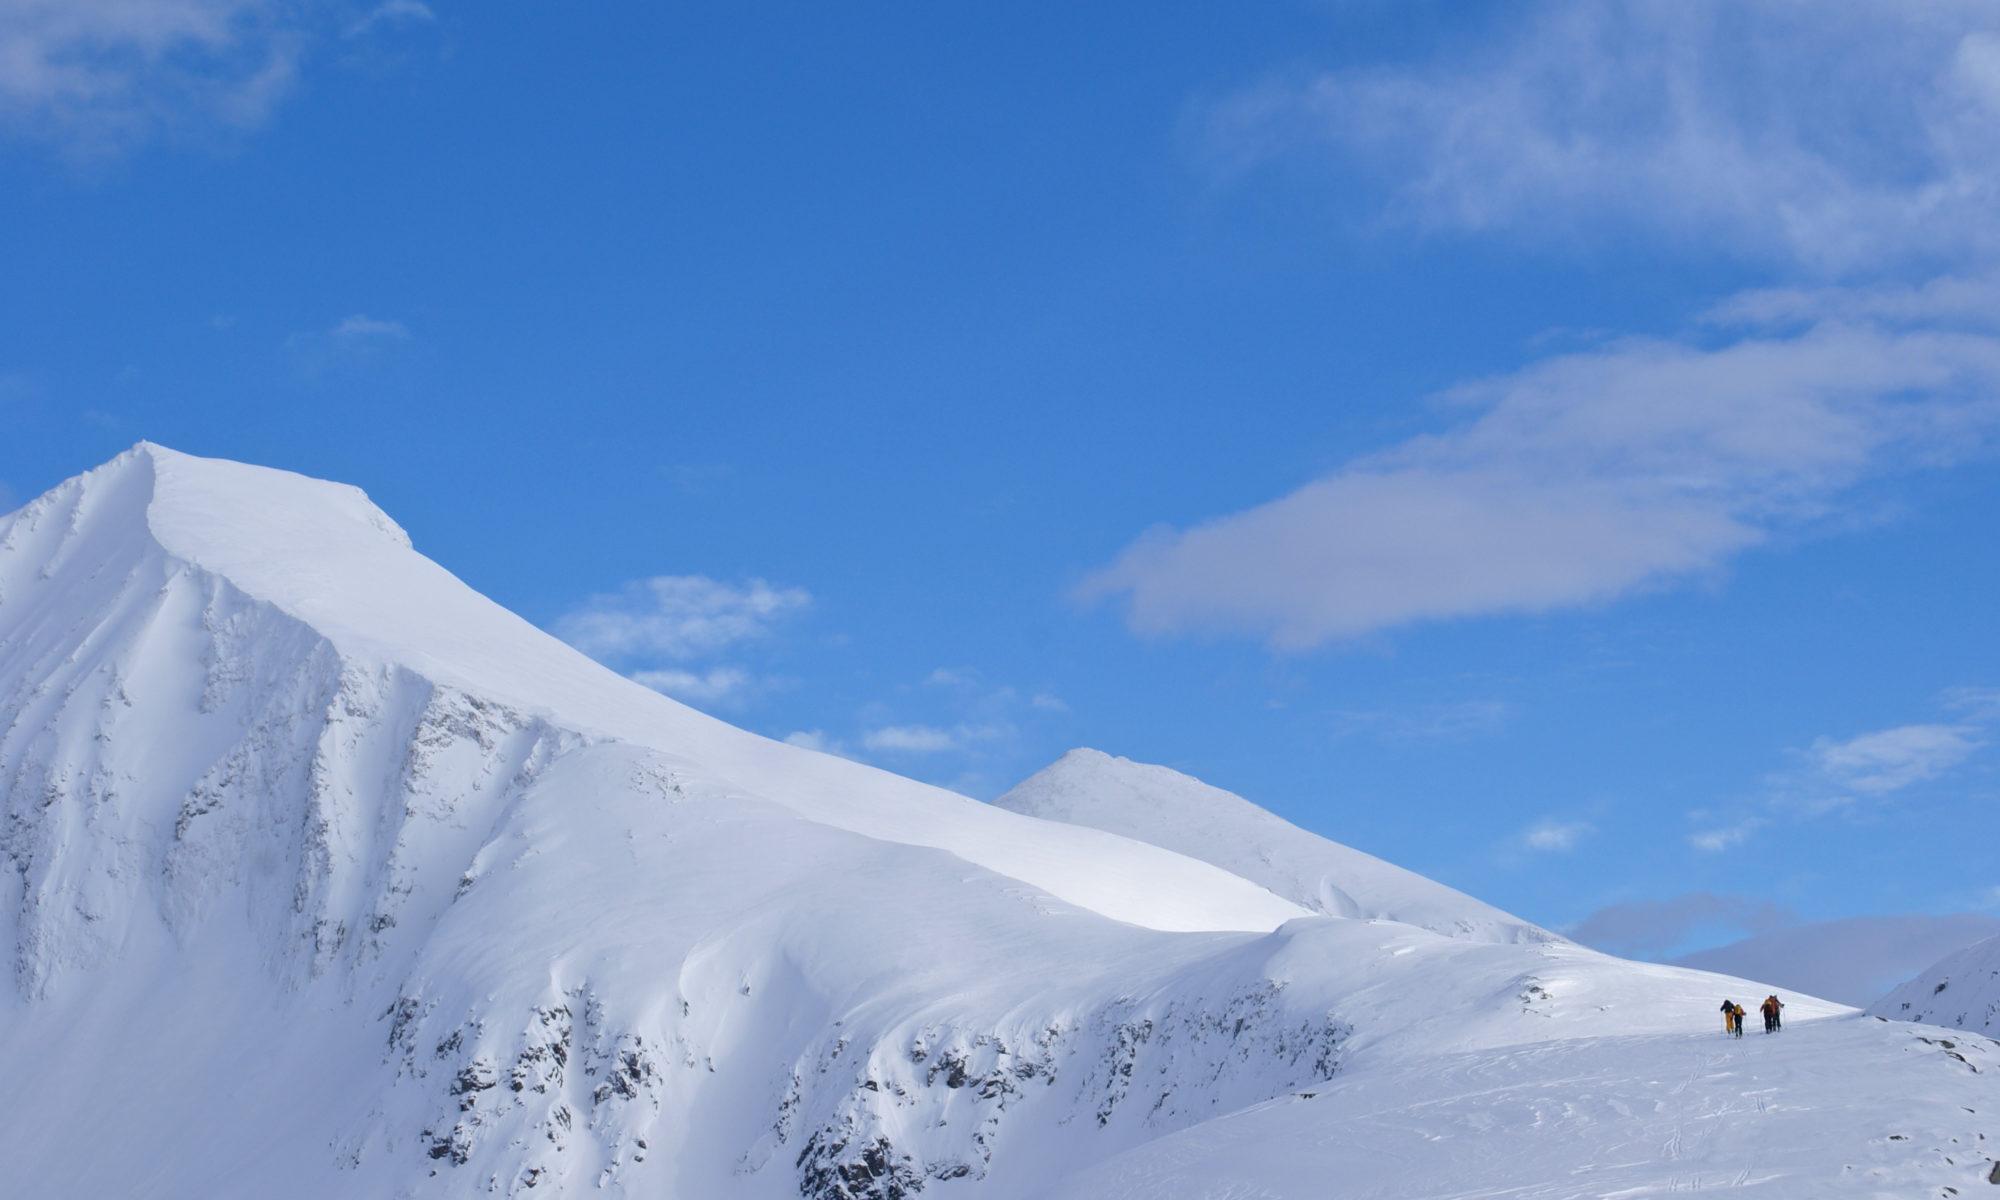 Kirketaket in Isfjorden, Romsdal.